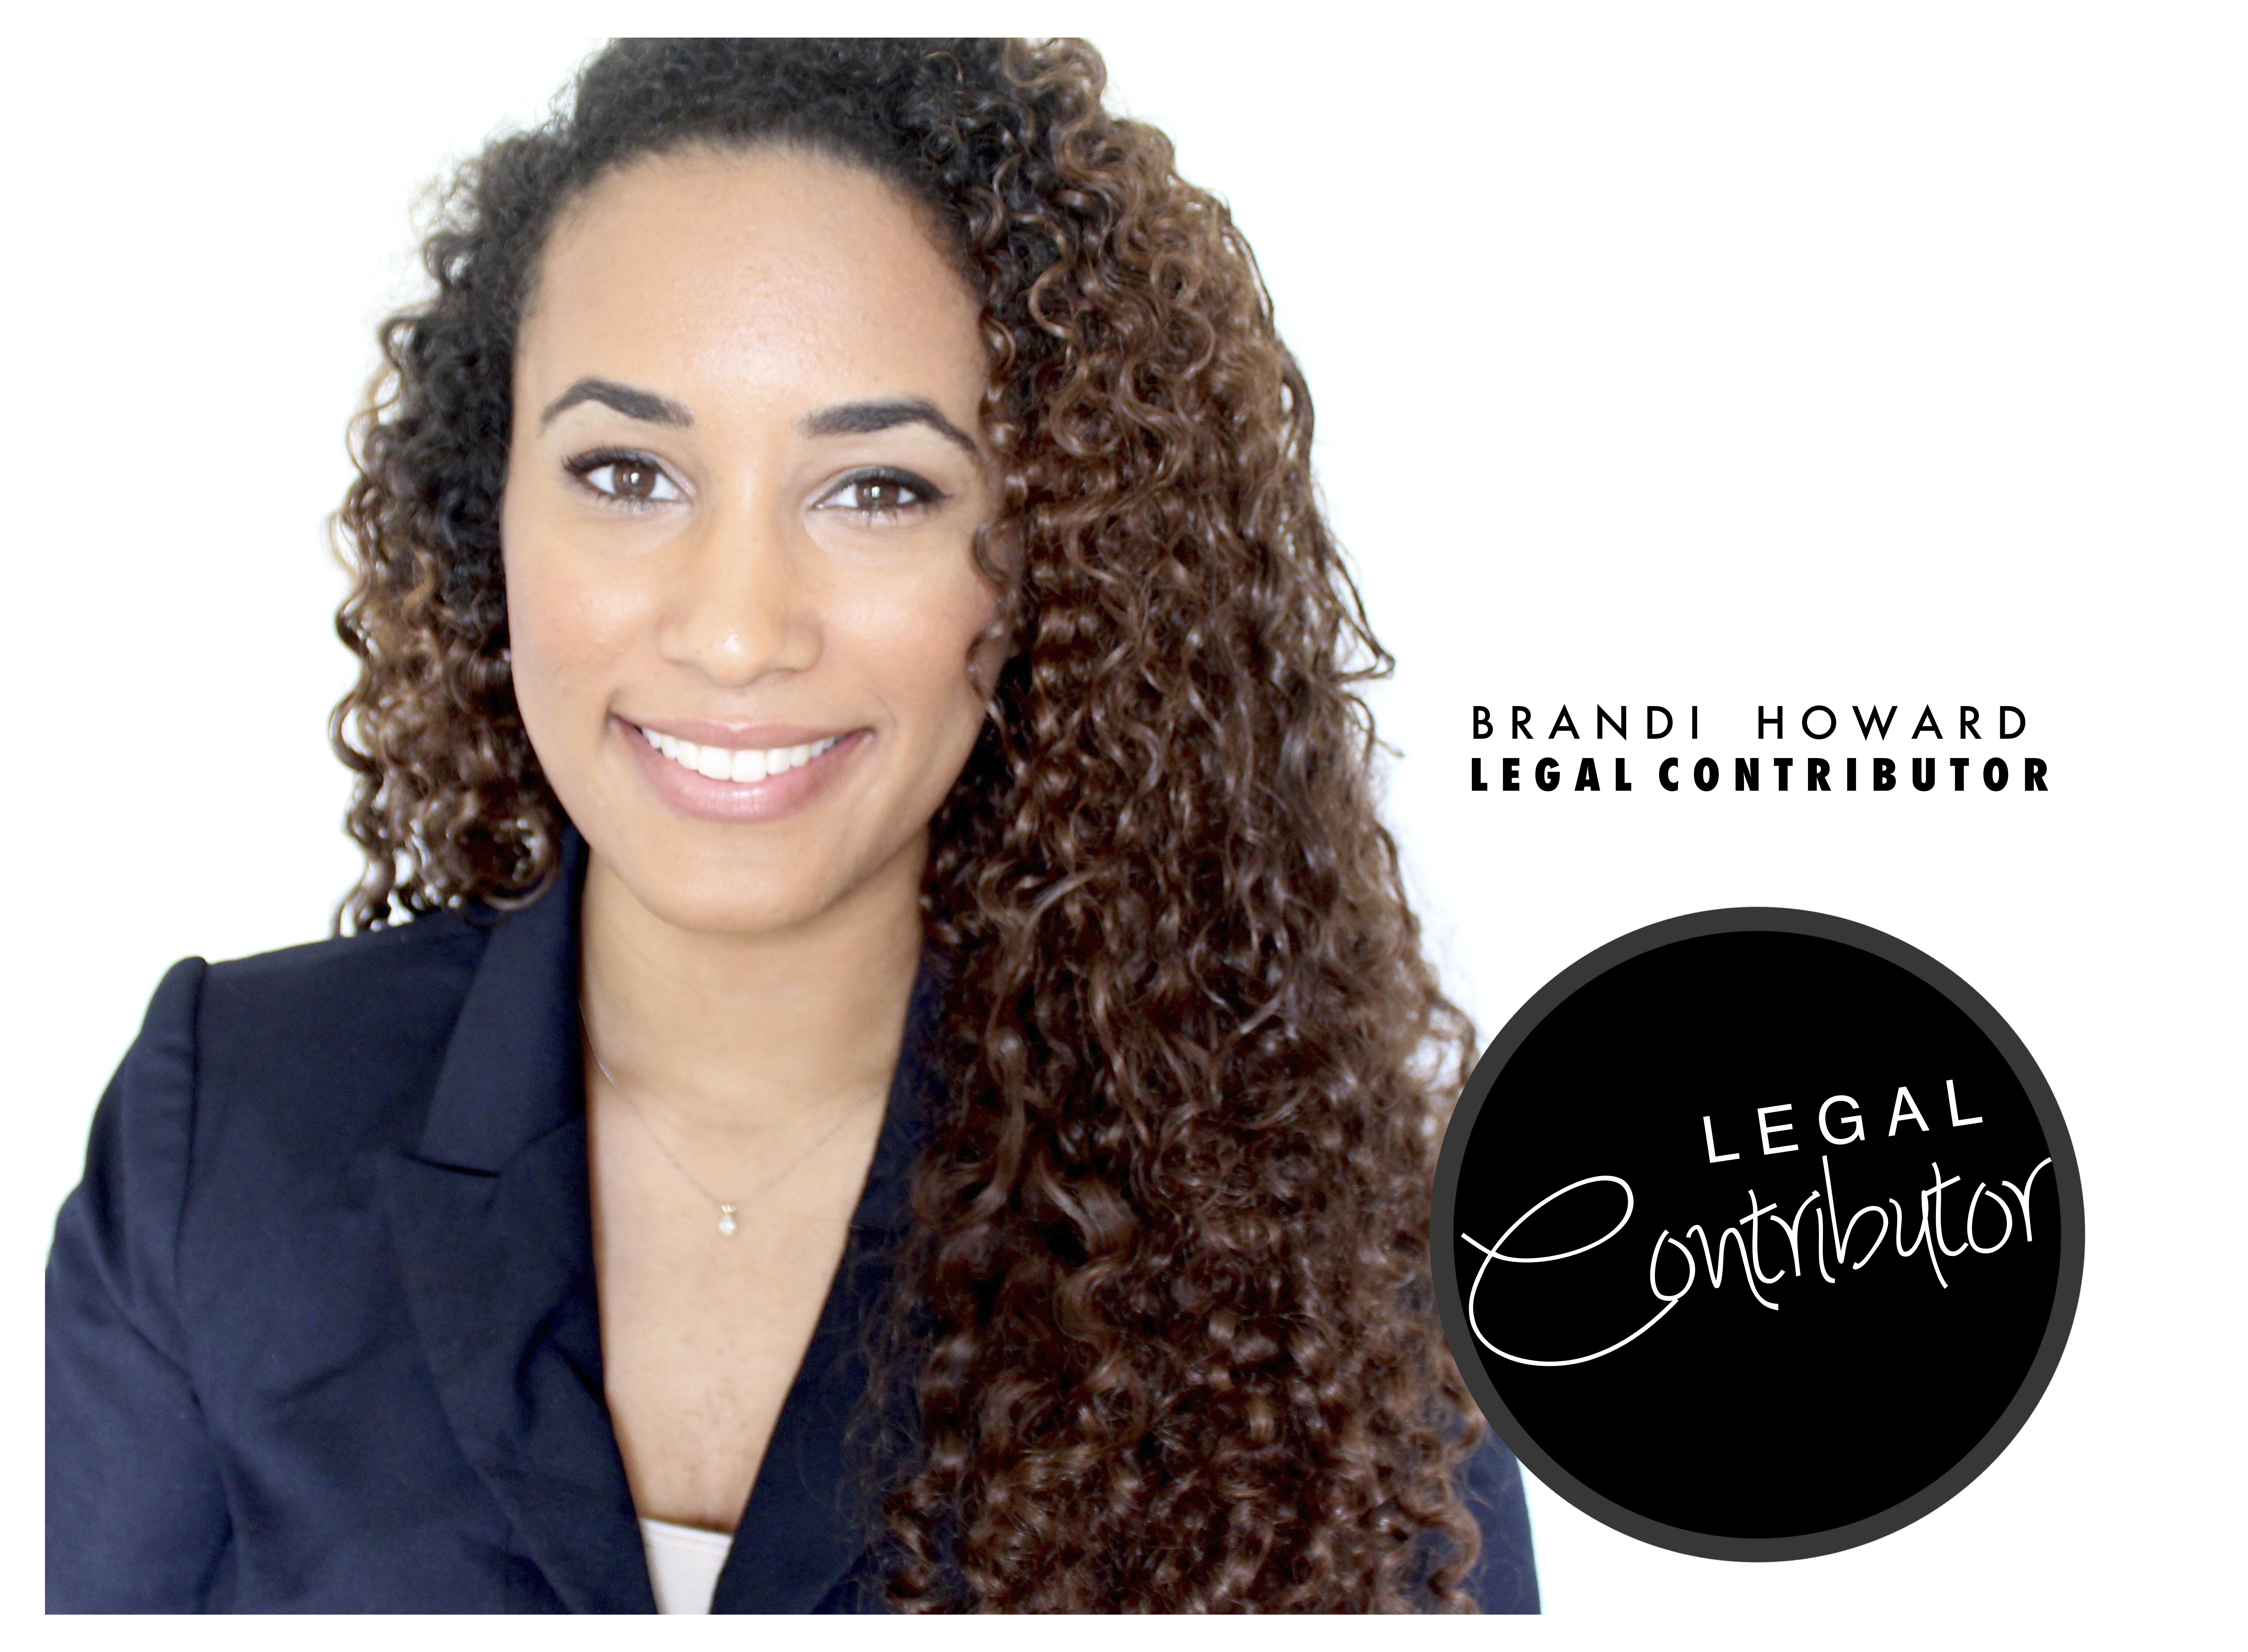 Law Contributor Brandi Howard